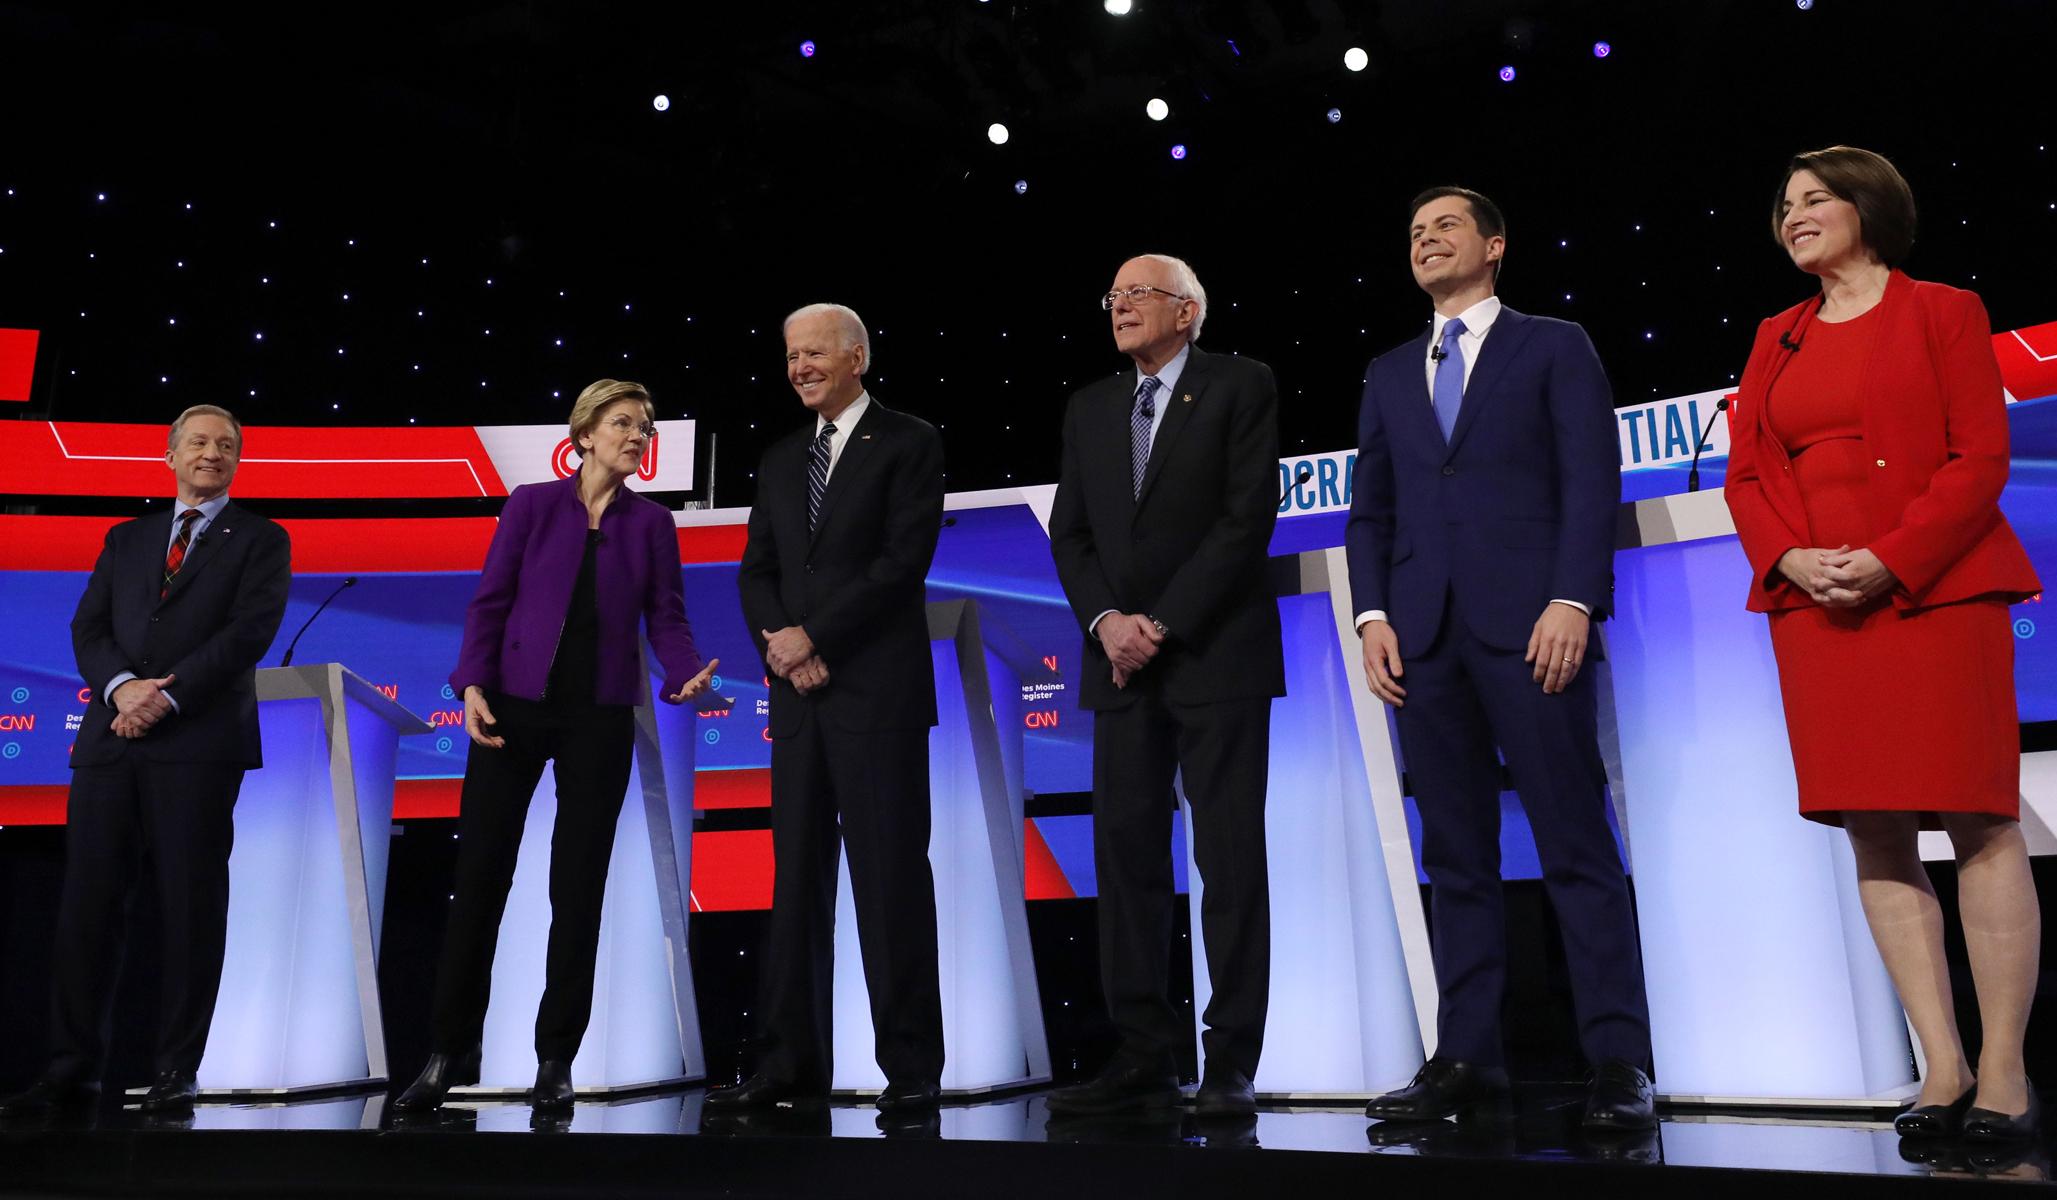 Starting Tuesday, Biden and Buttigieg Have a Gargantuan Advantage